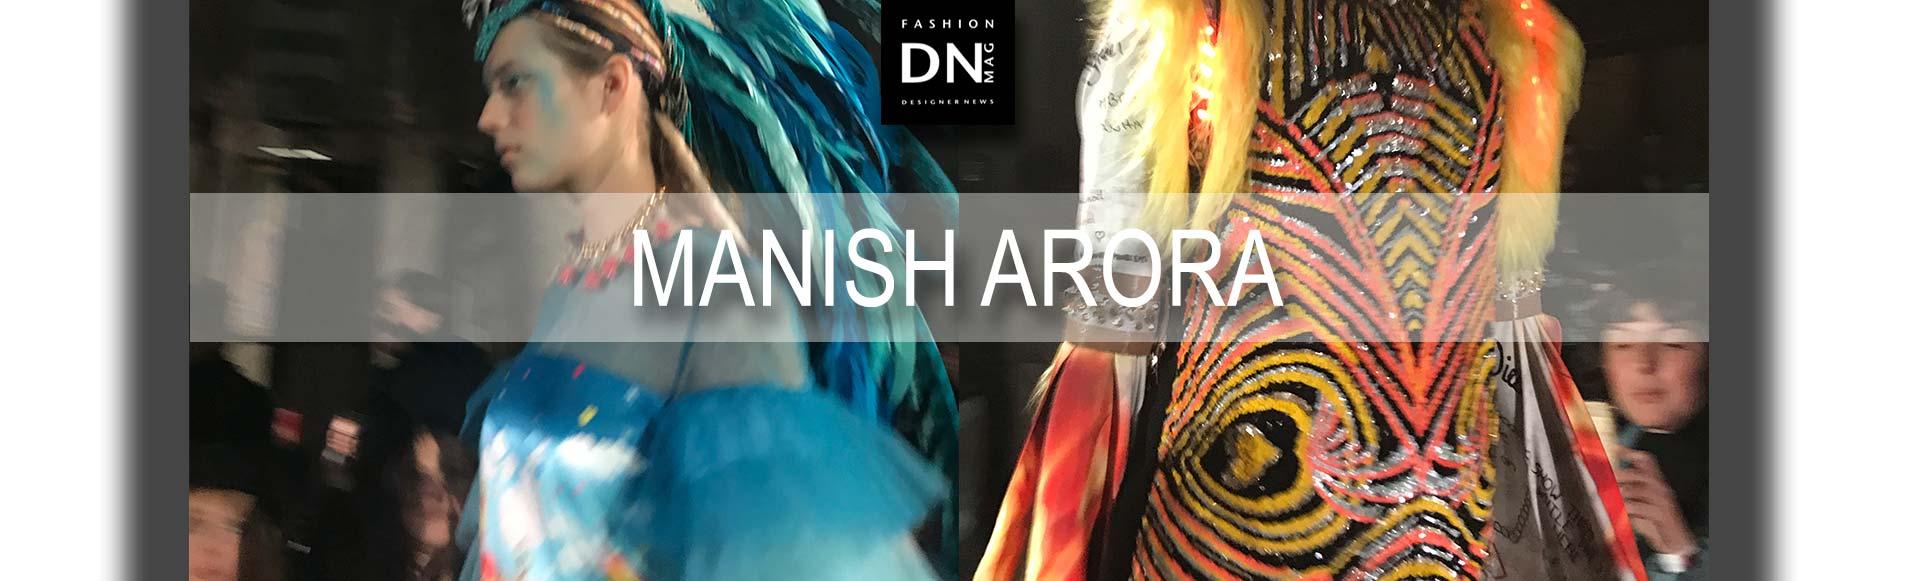 MANISH-ARORA-RTW-19-FW-2019-DNMAG